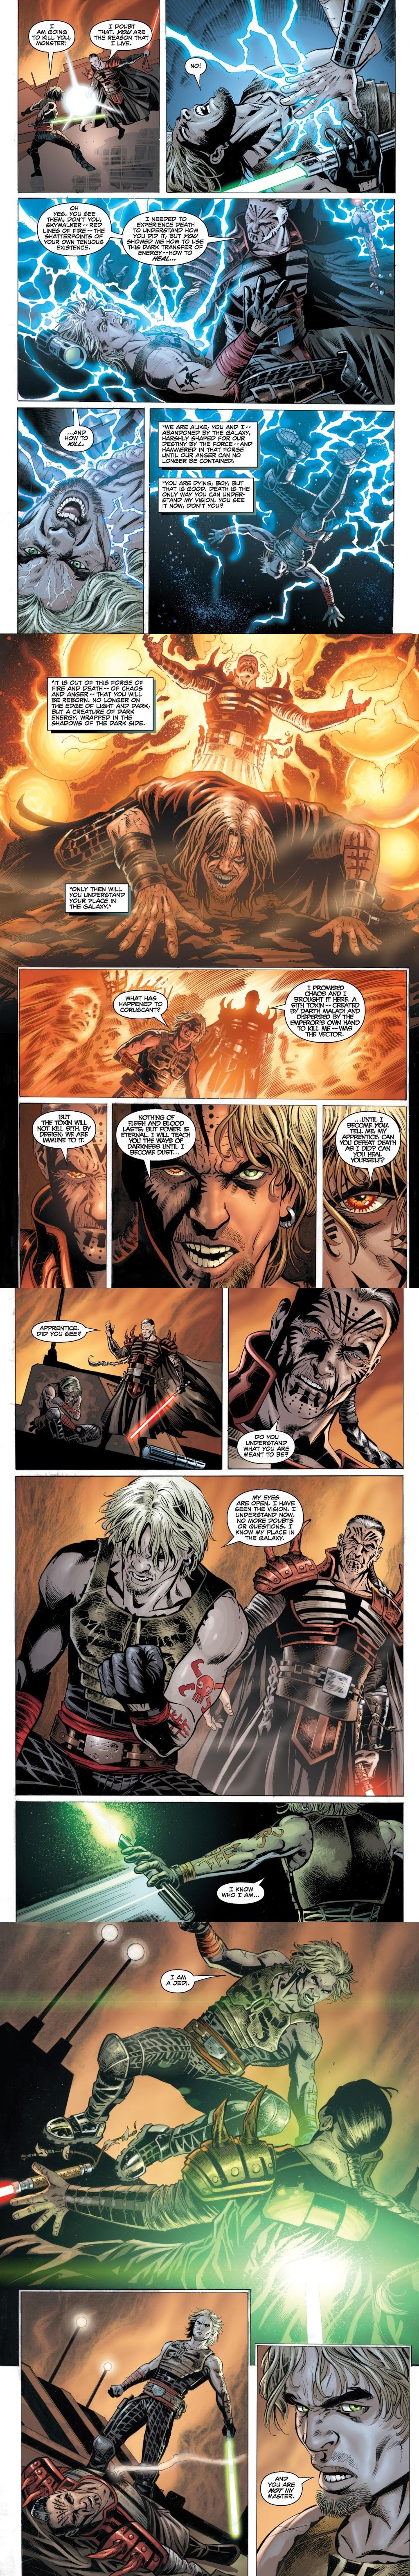 Stomper Showdown R2 #8 - Antares Draco (Informal Geek) vs TUF! Jacen Solo (RNGesus4) Cade_Cheapshot